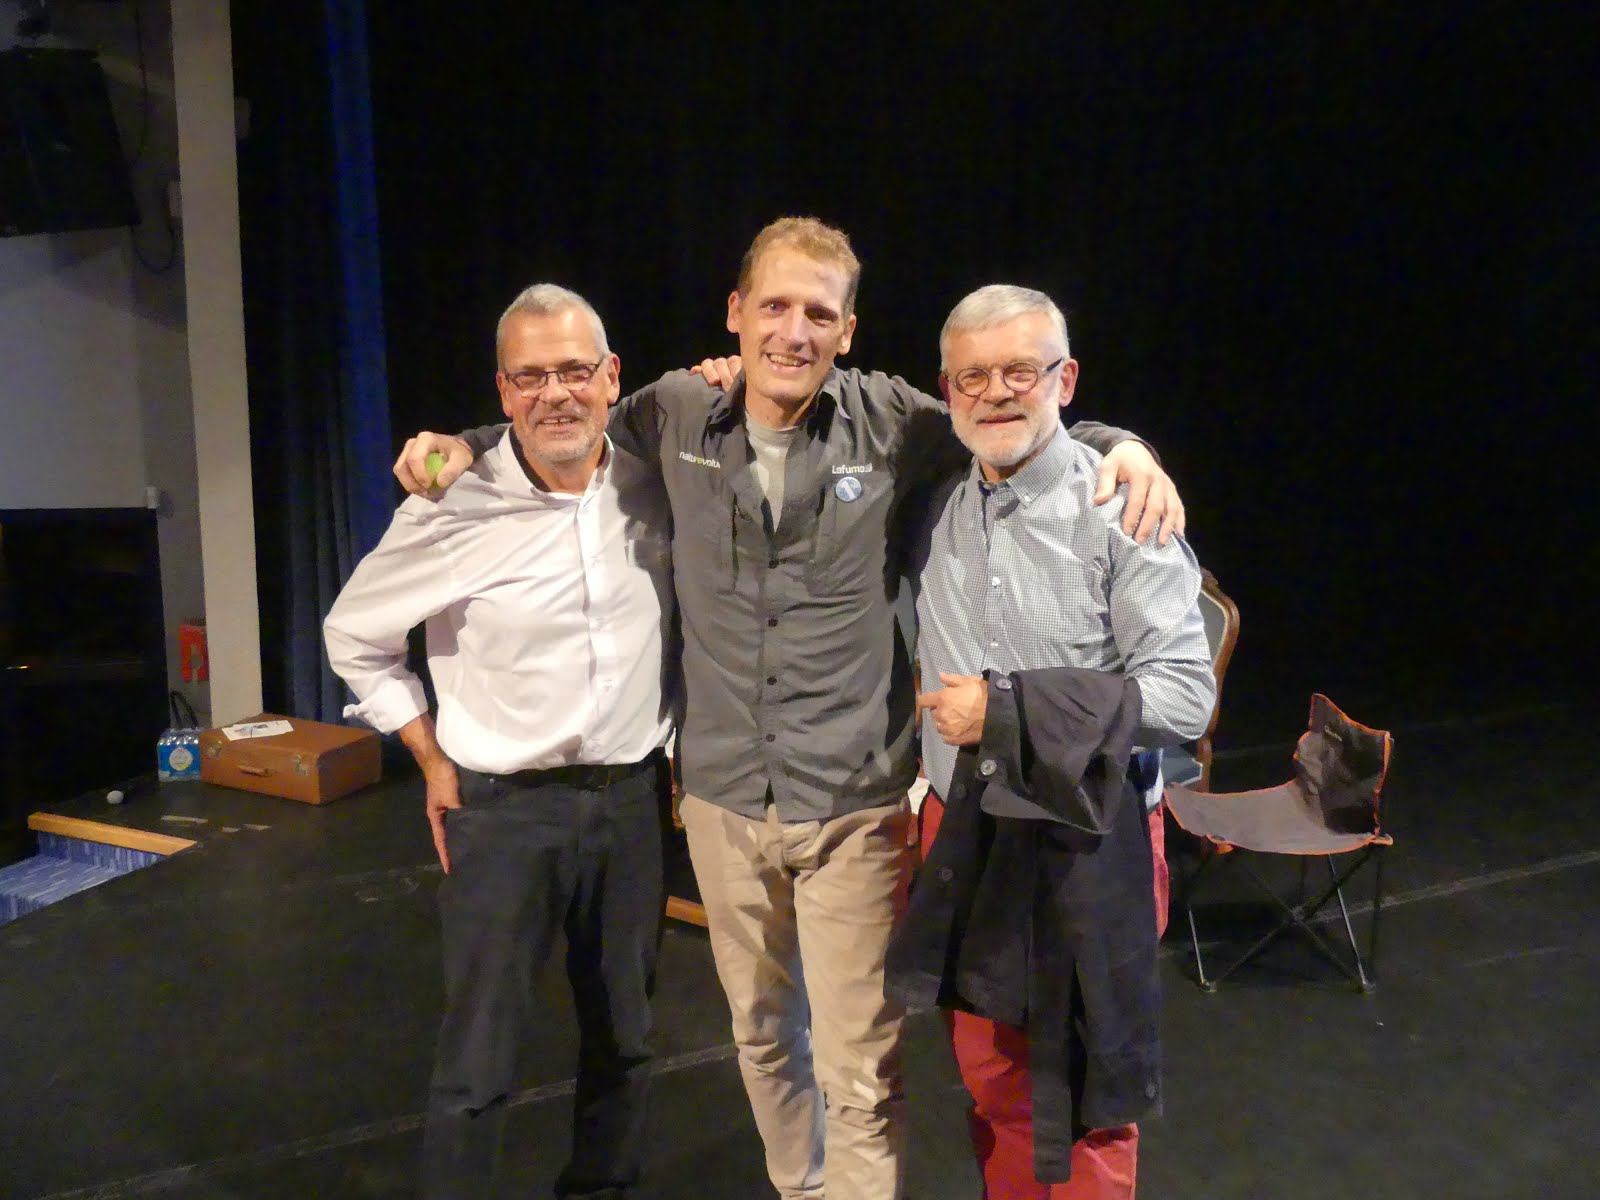 Evrard Wendenbaum, Invité d'honneur 2018